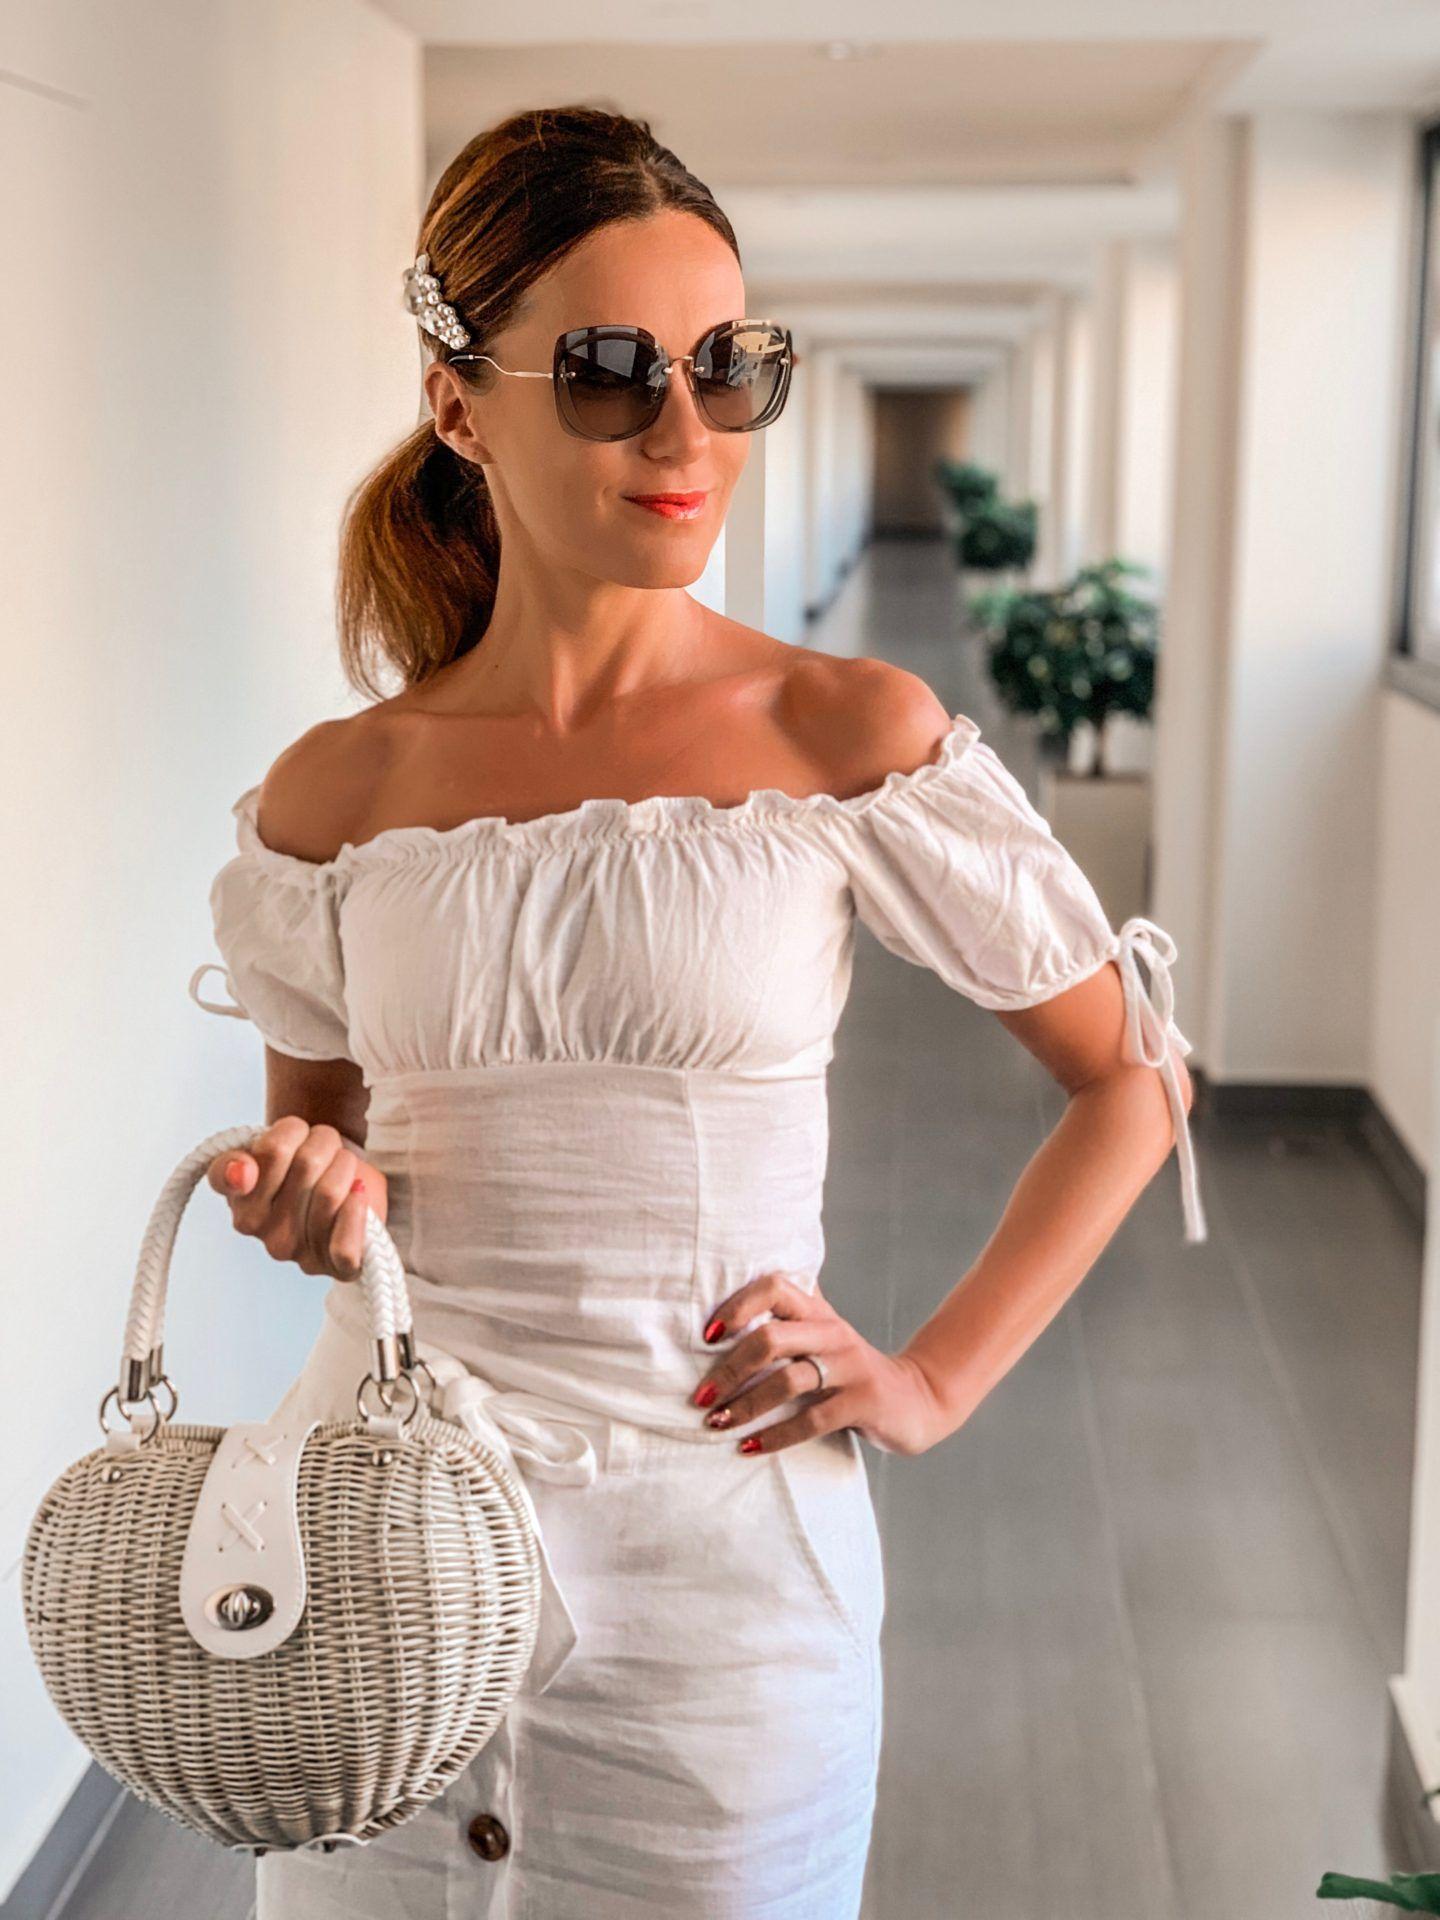 Atrium Platinum Luxury Resort Hotel and SPA, Rhodes Greece Elegant Duchess Boutique Chic Heart shaped Straw Bag